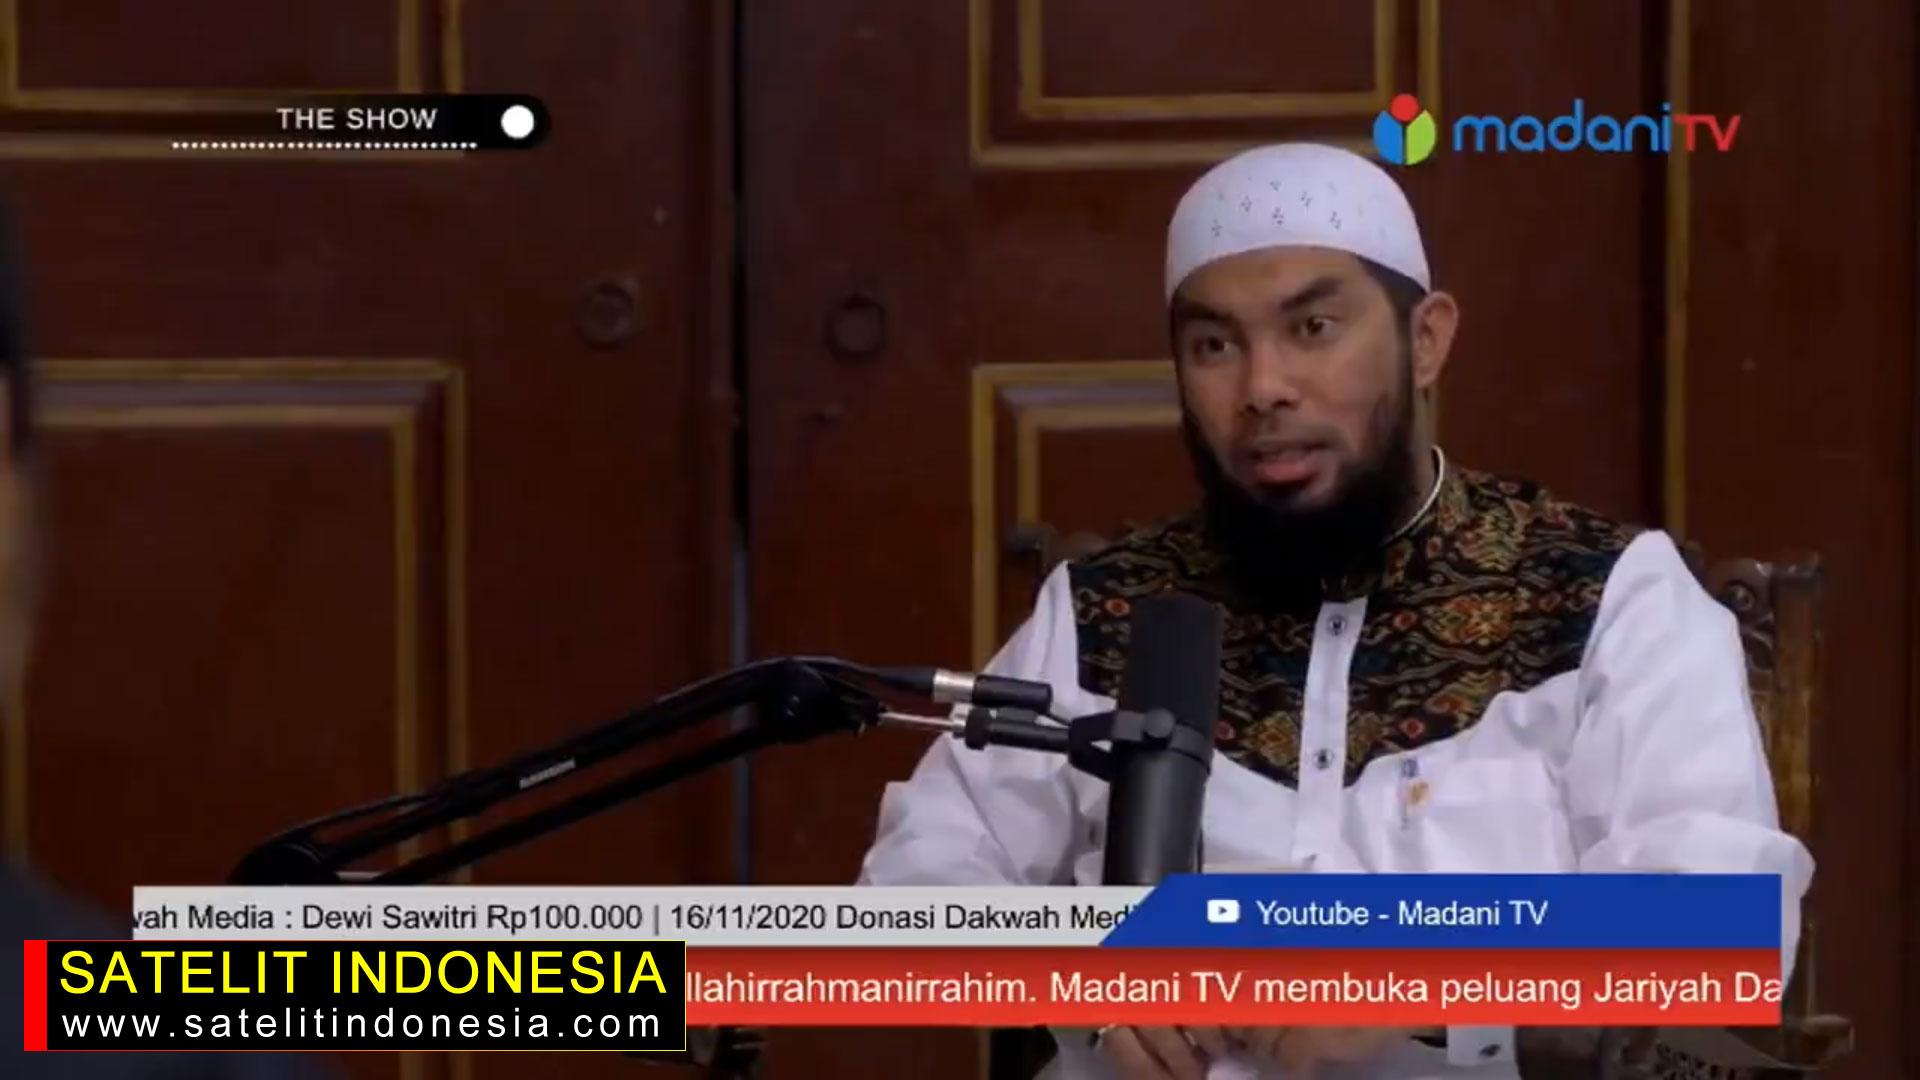 Frekuensi siaran Madani MPEG4 di satelit Telkom 4 Terbaru